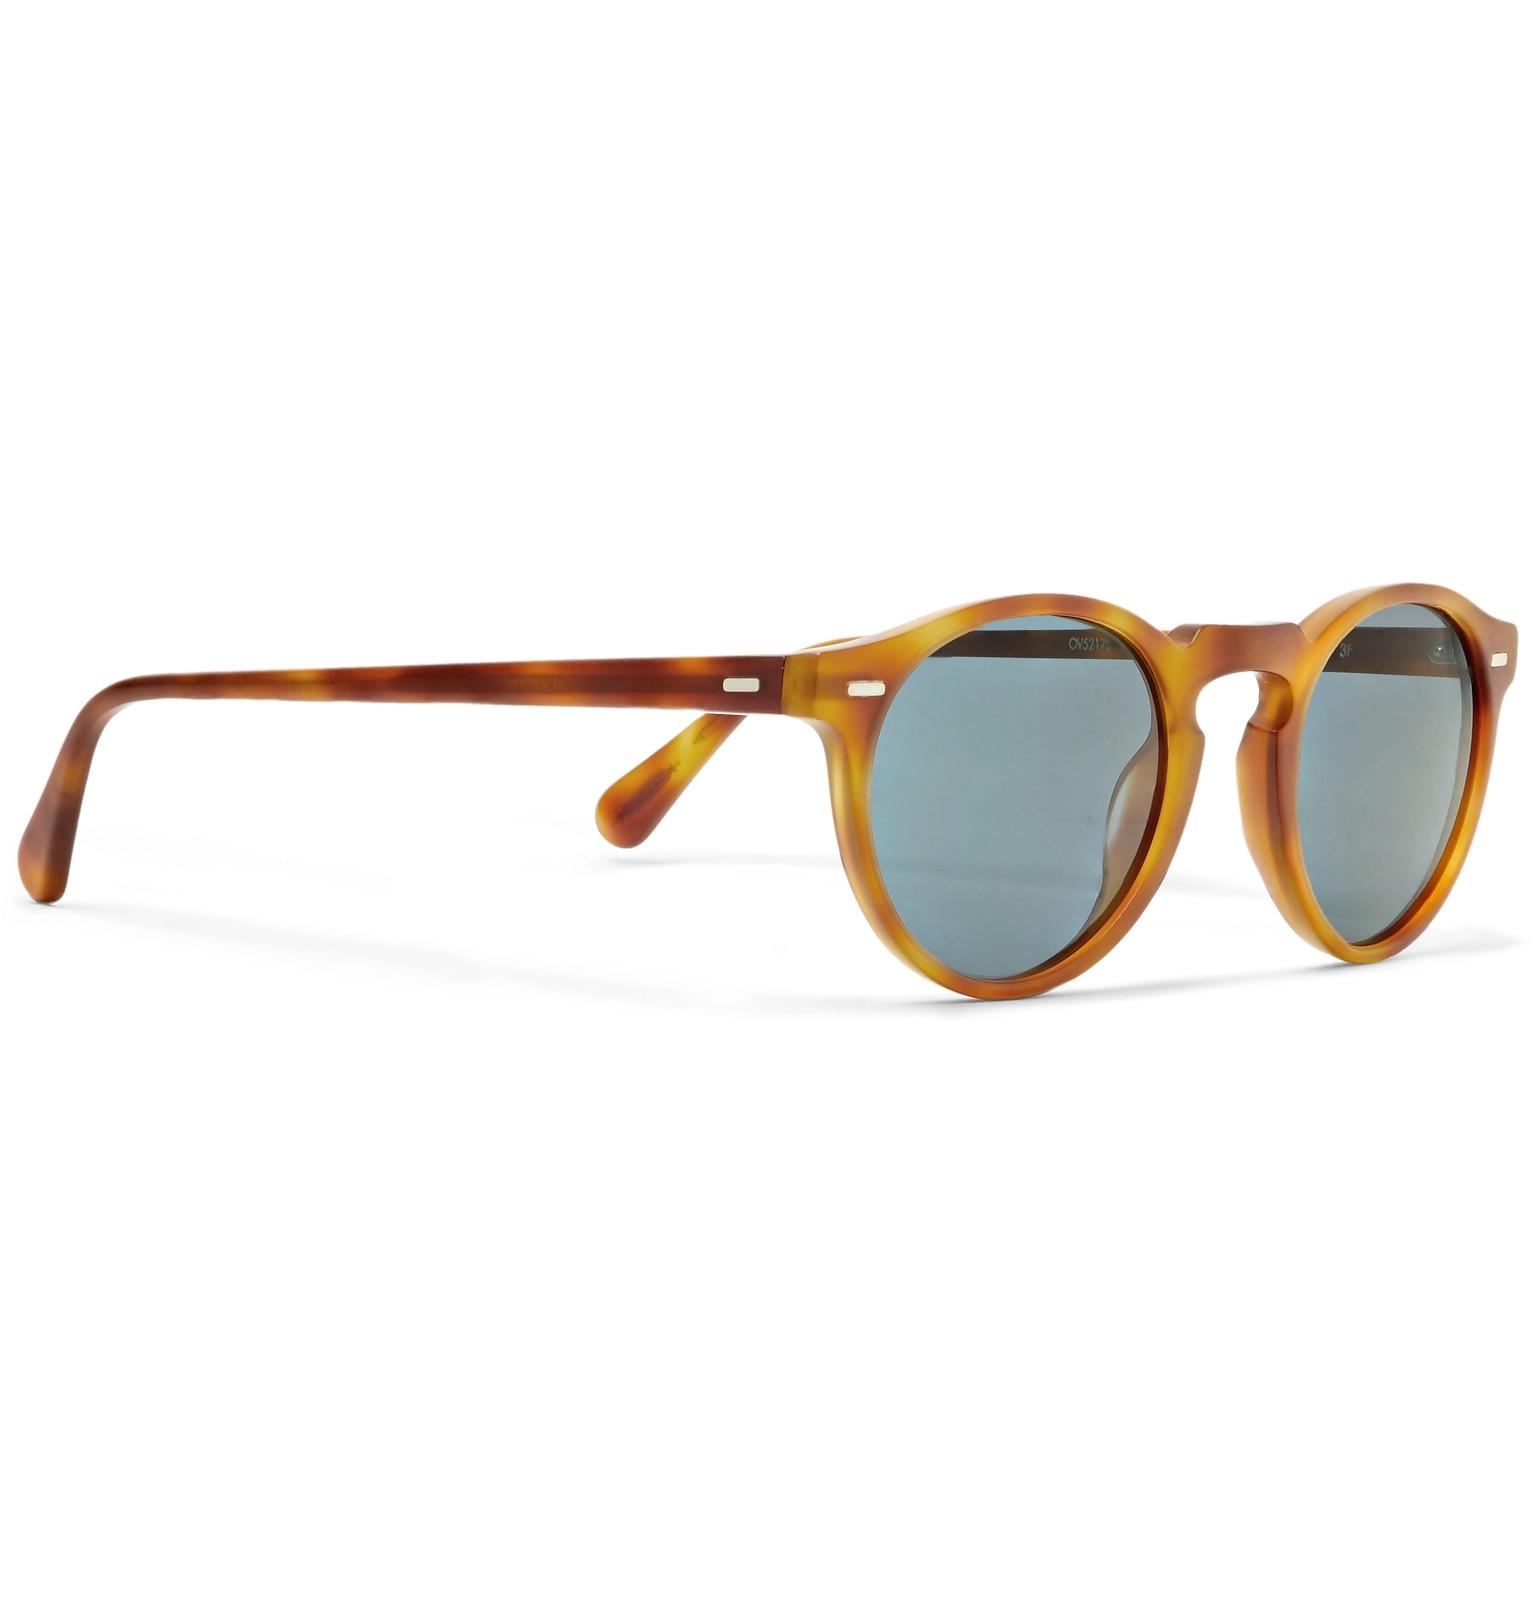 564eb3569a Oliver PeoplesGregory Peck Round-Frame Tortoiseshell Acetate Photochromic  Sunglasses